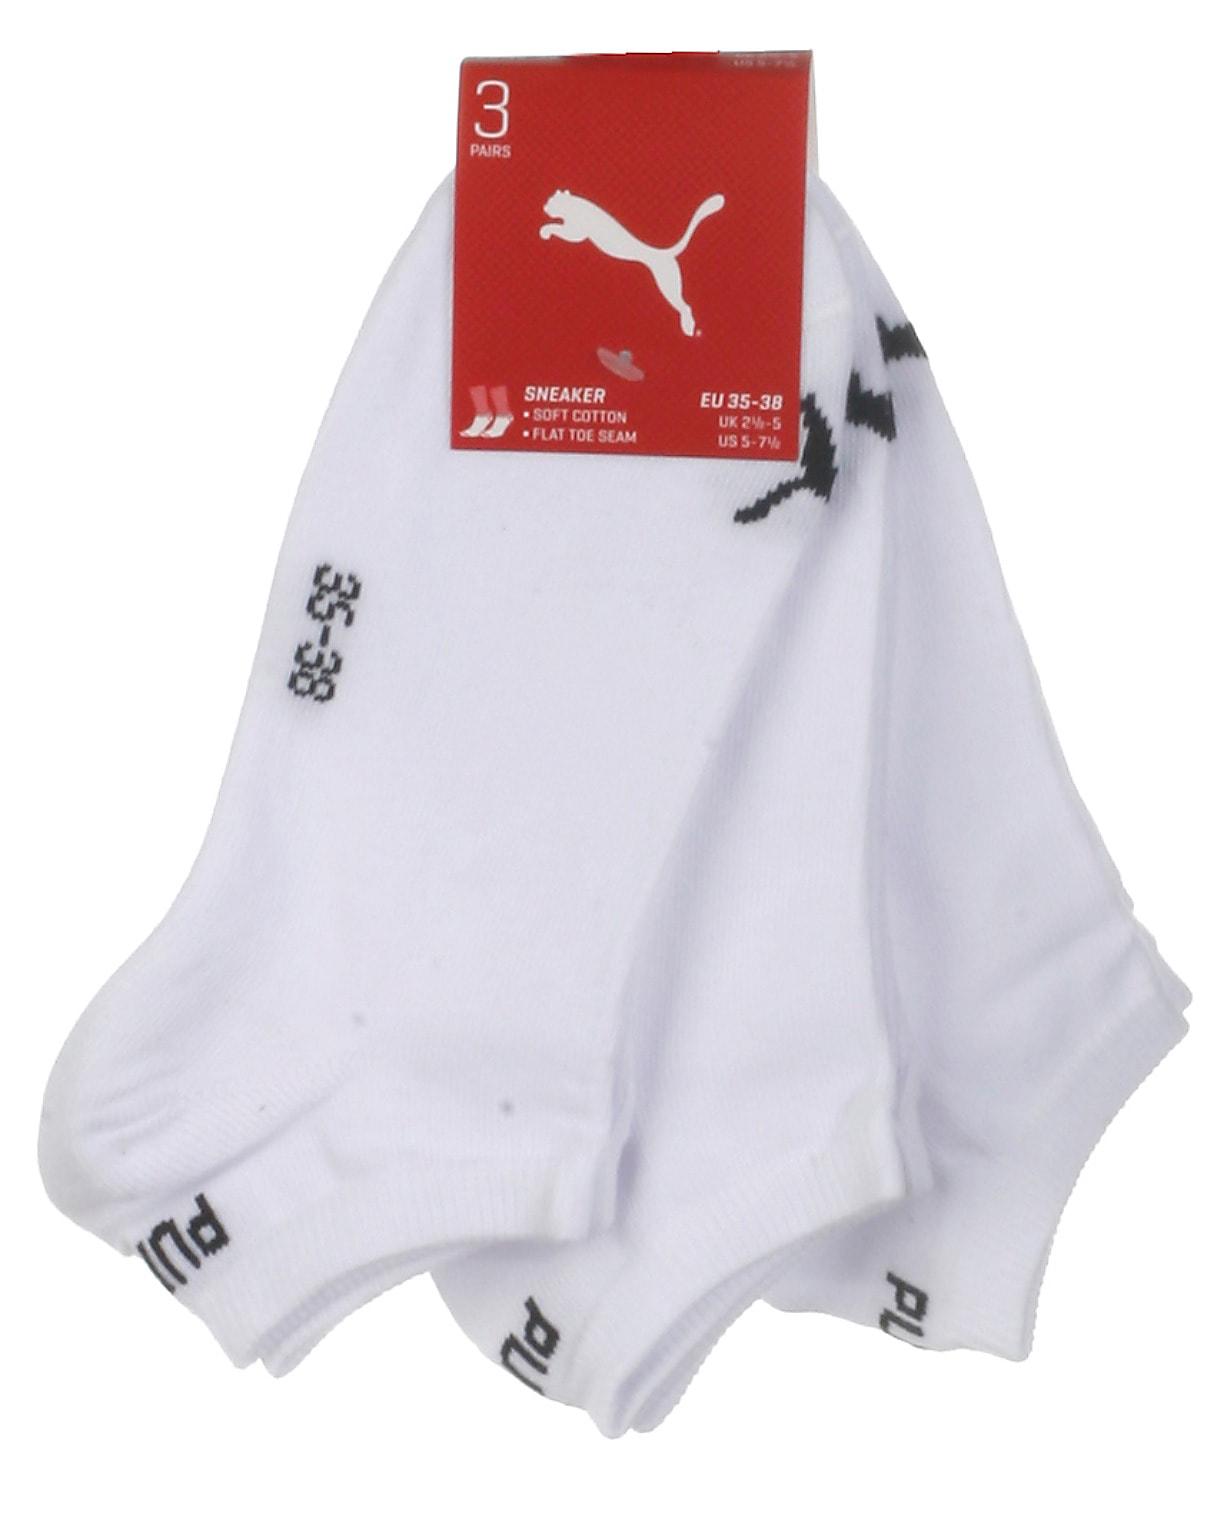 Puma 3-pak sneaker strømper, hvid